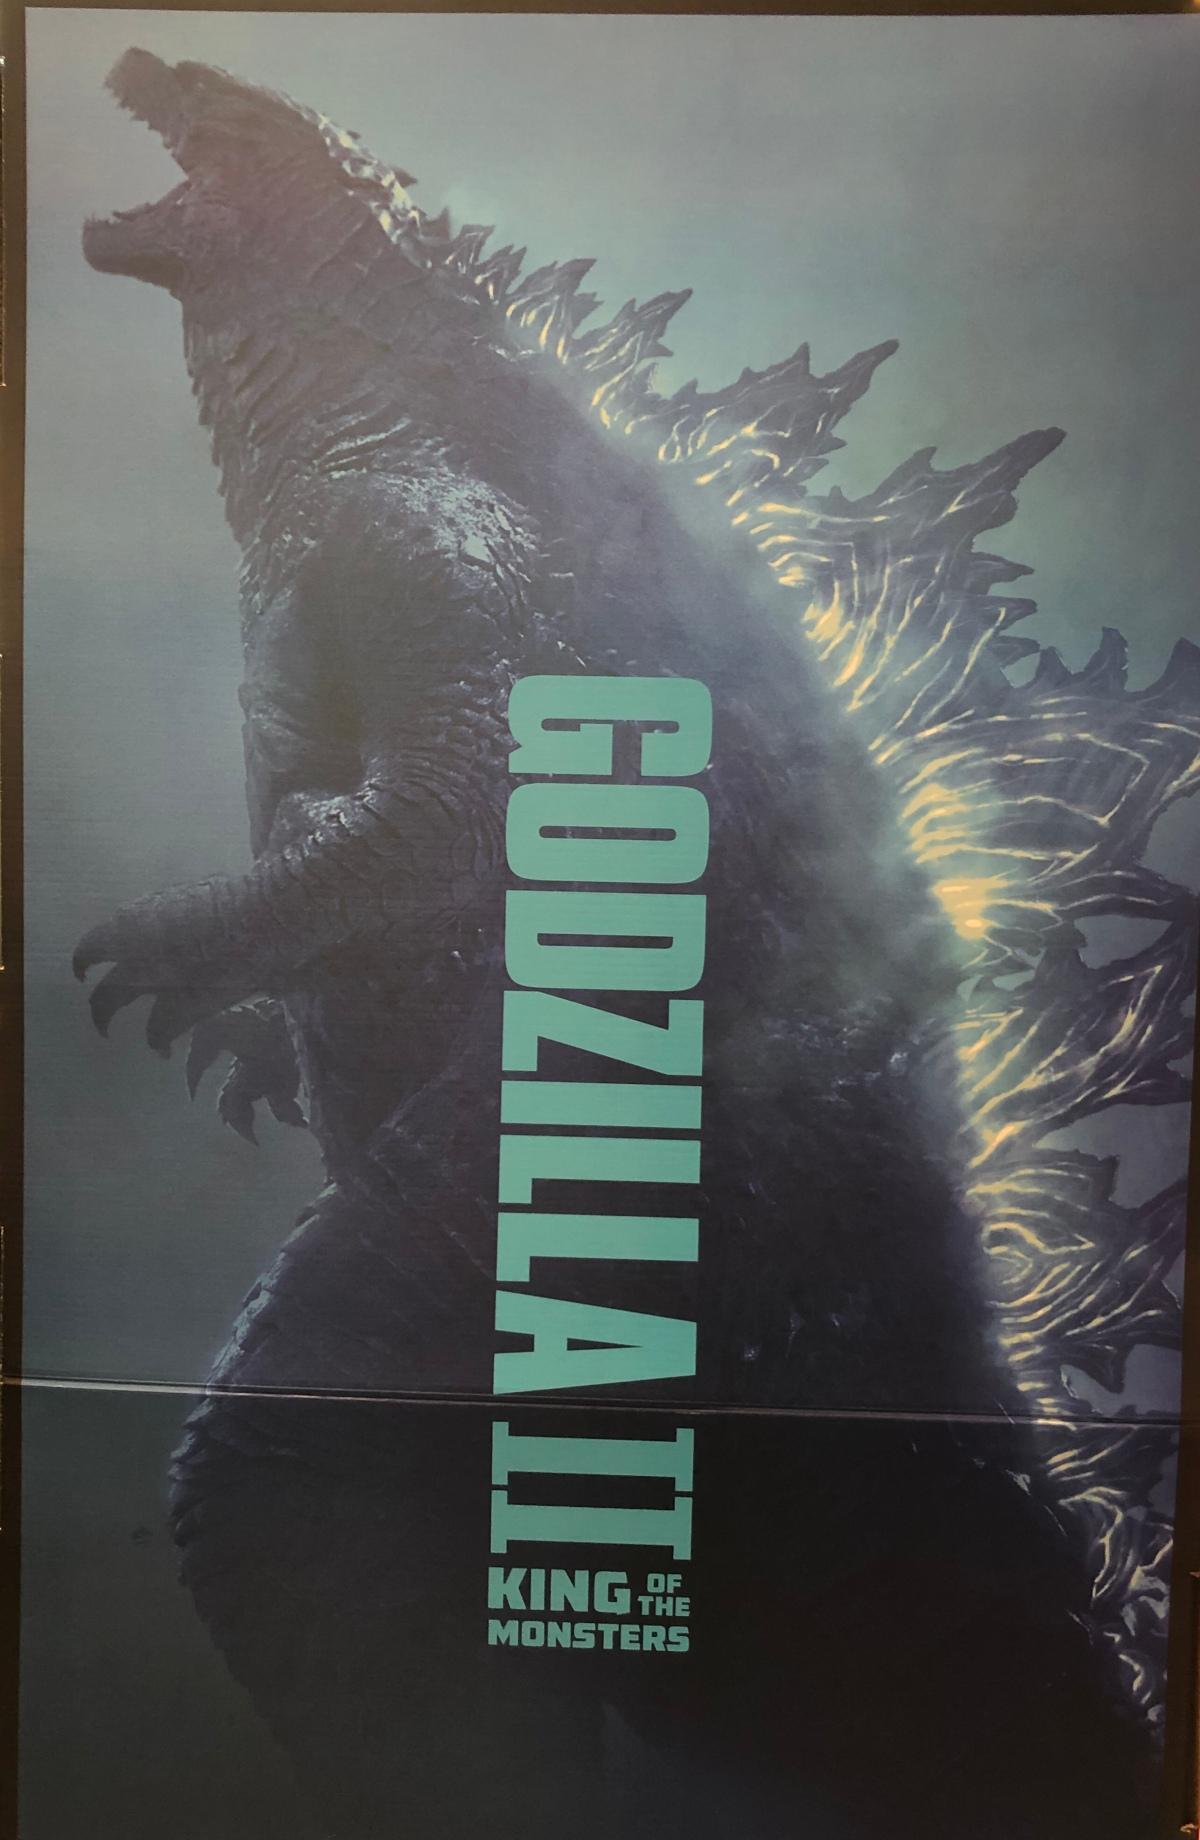 Godzilla 2: King of the Monsters oder wo liegt das Problem? |Gedankenspiel